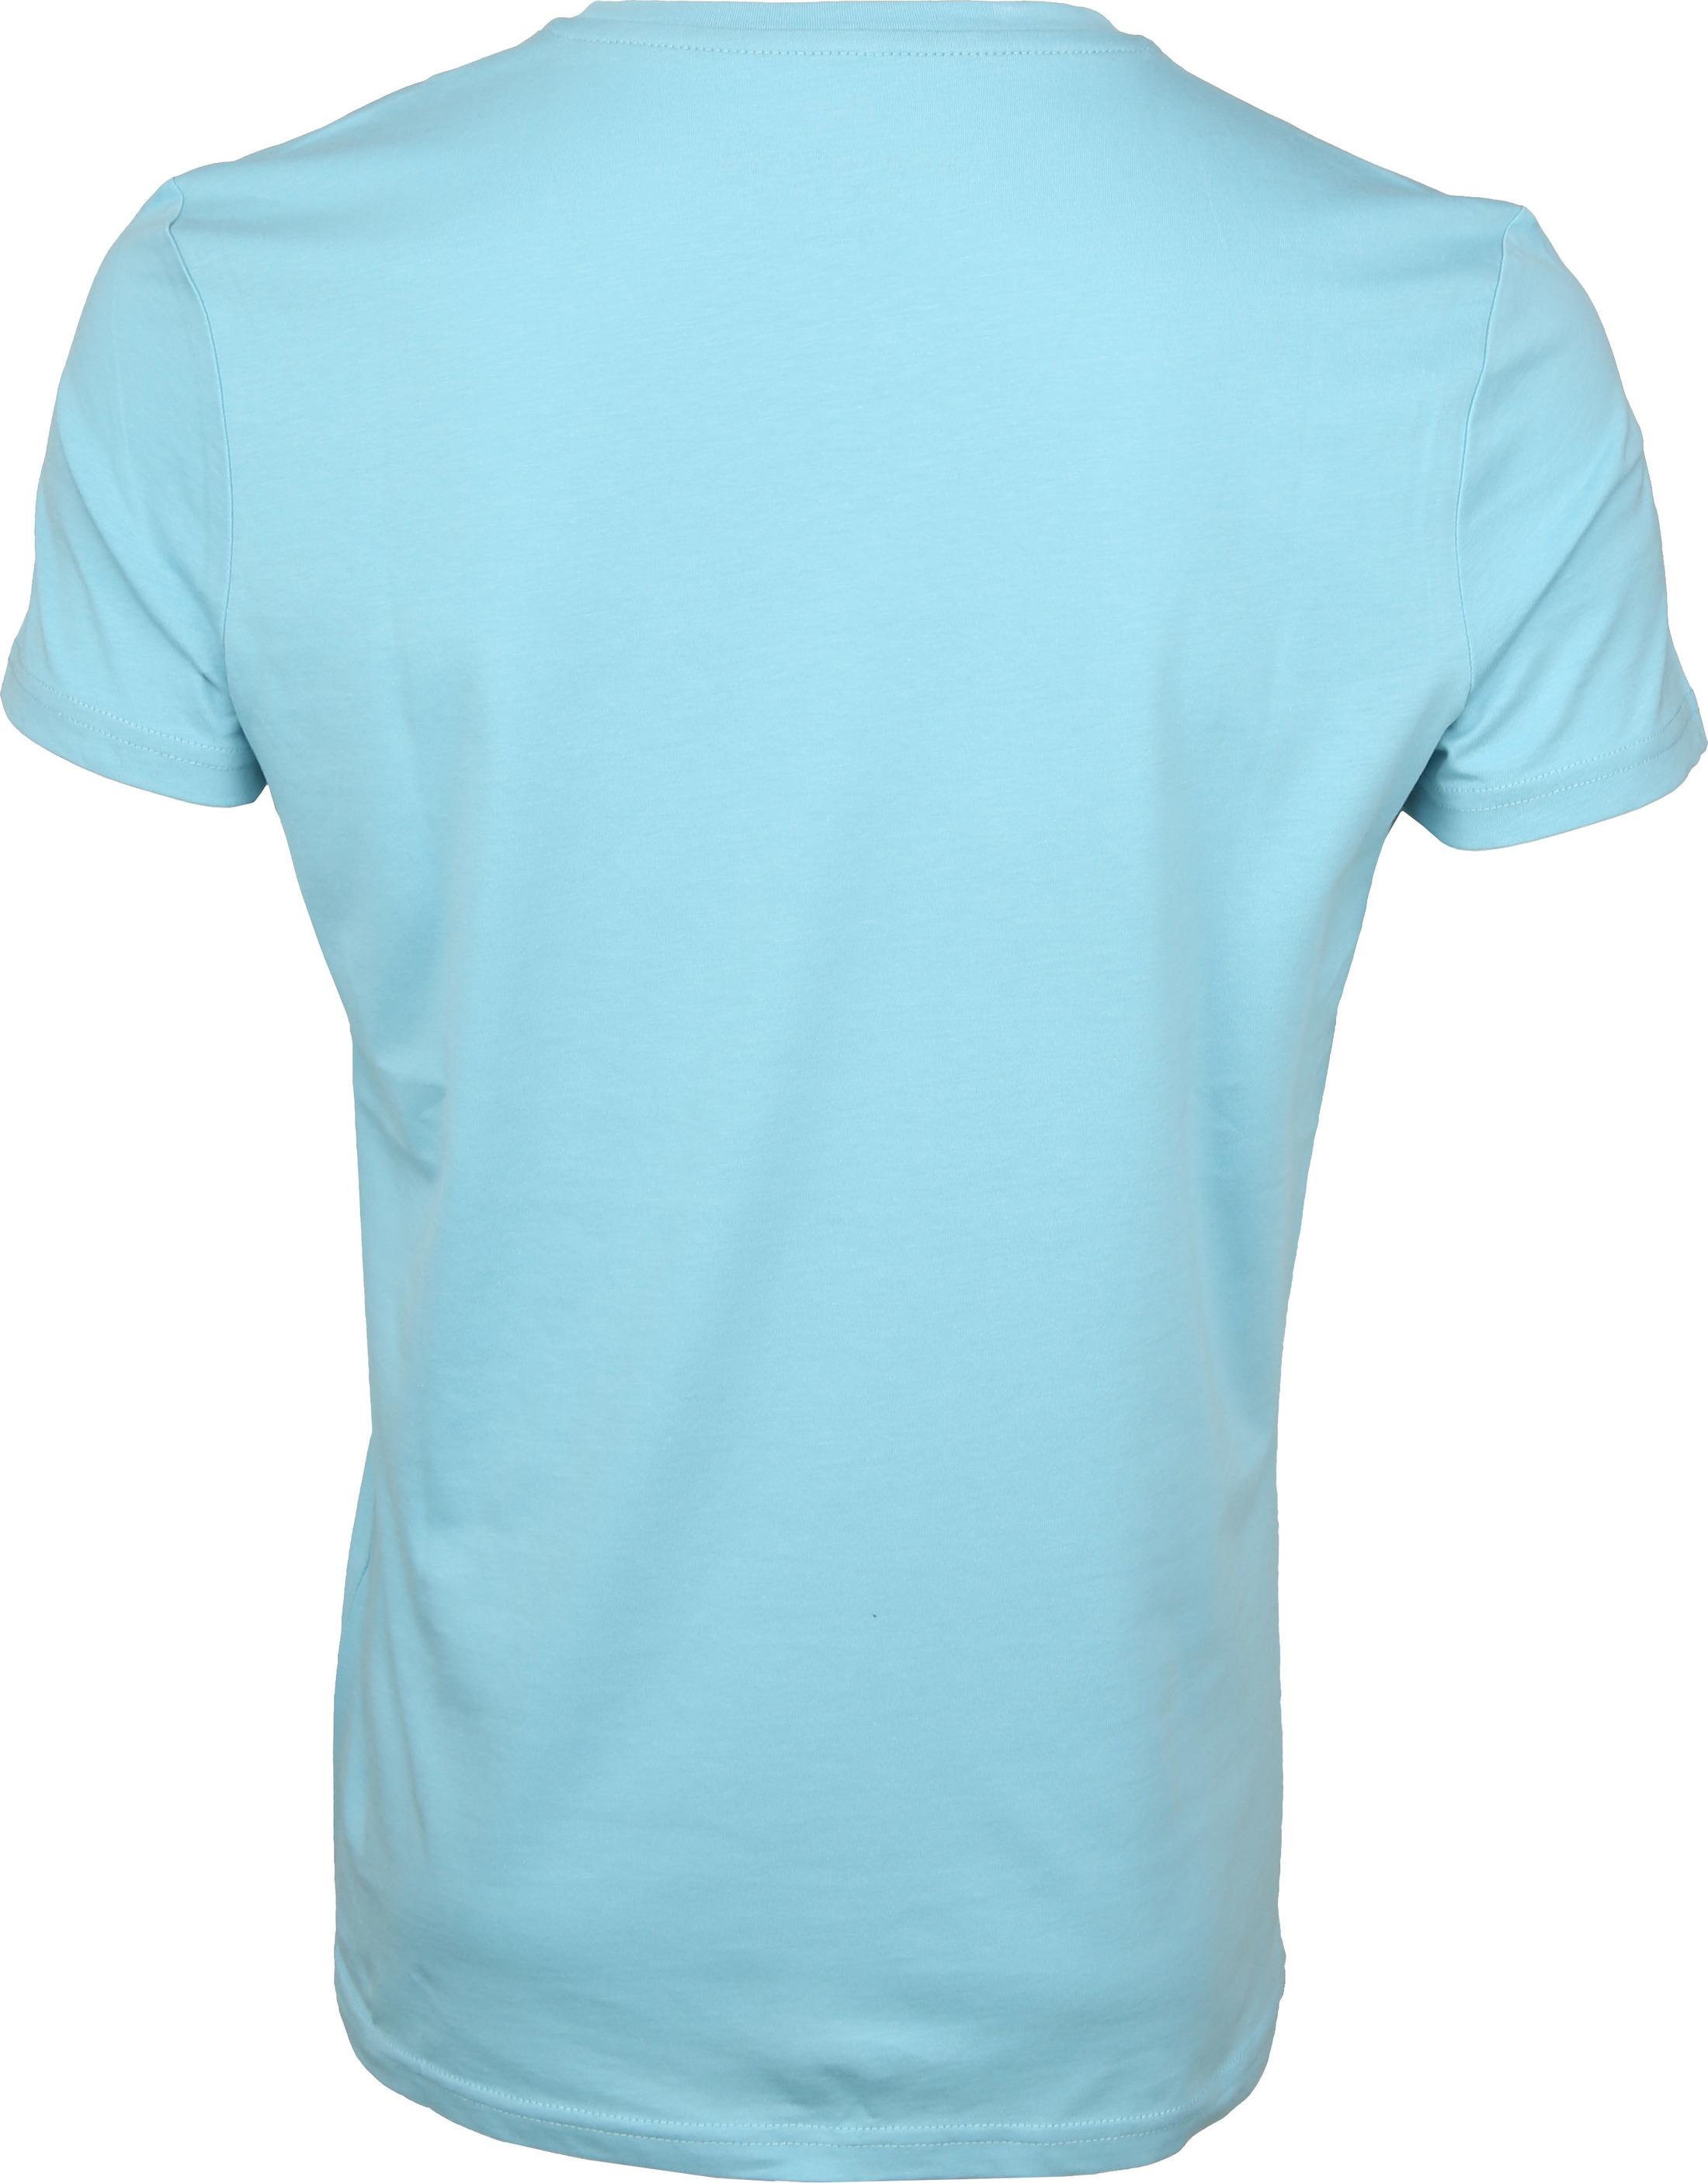 New in Town T-shirt Light Blue foto 2